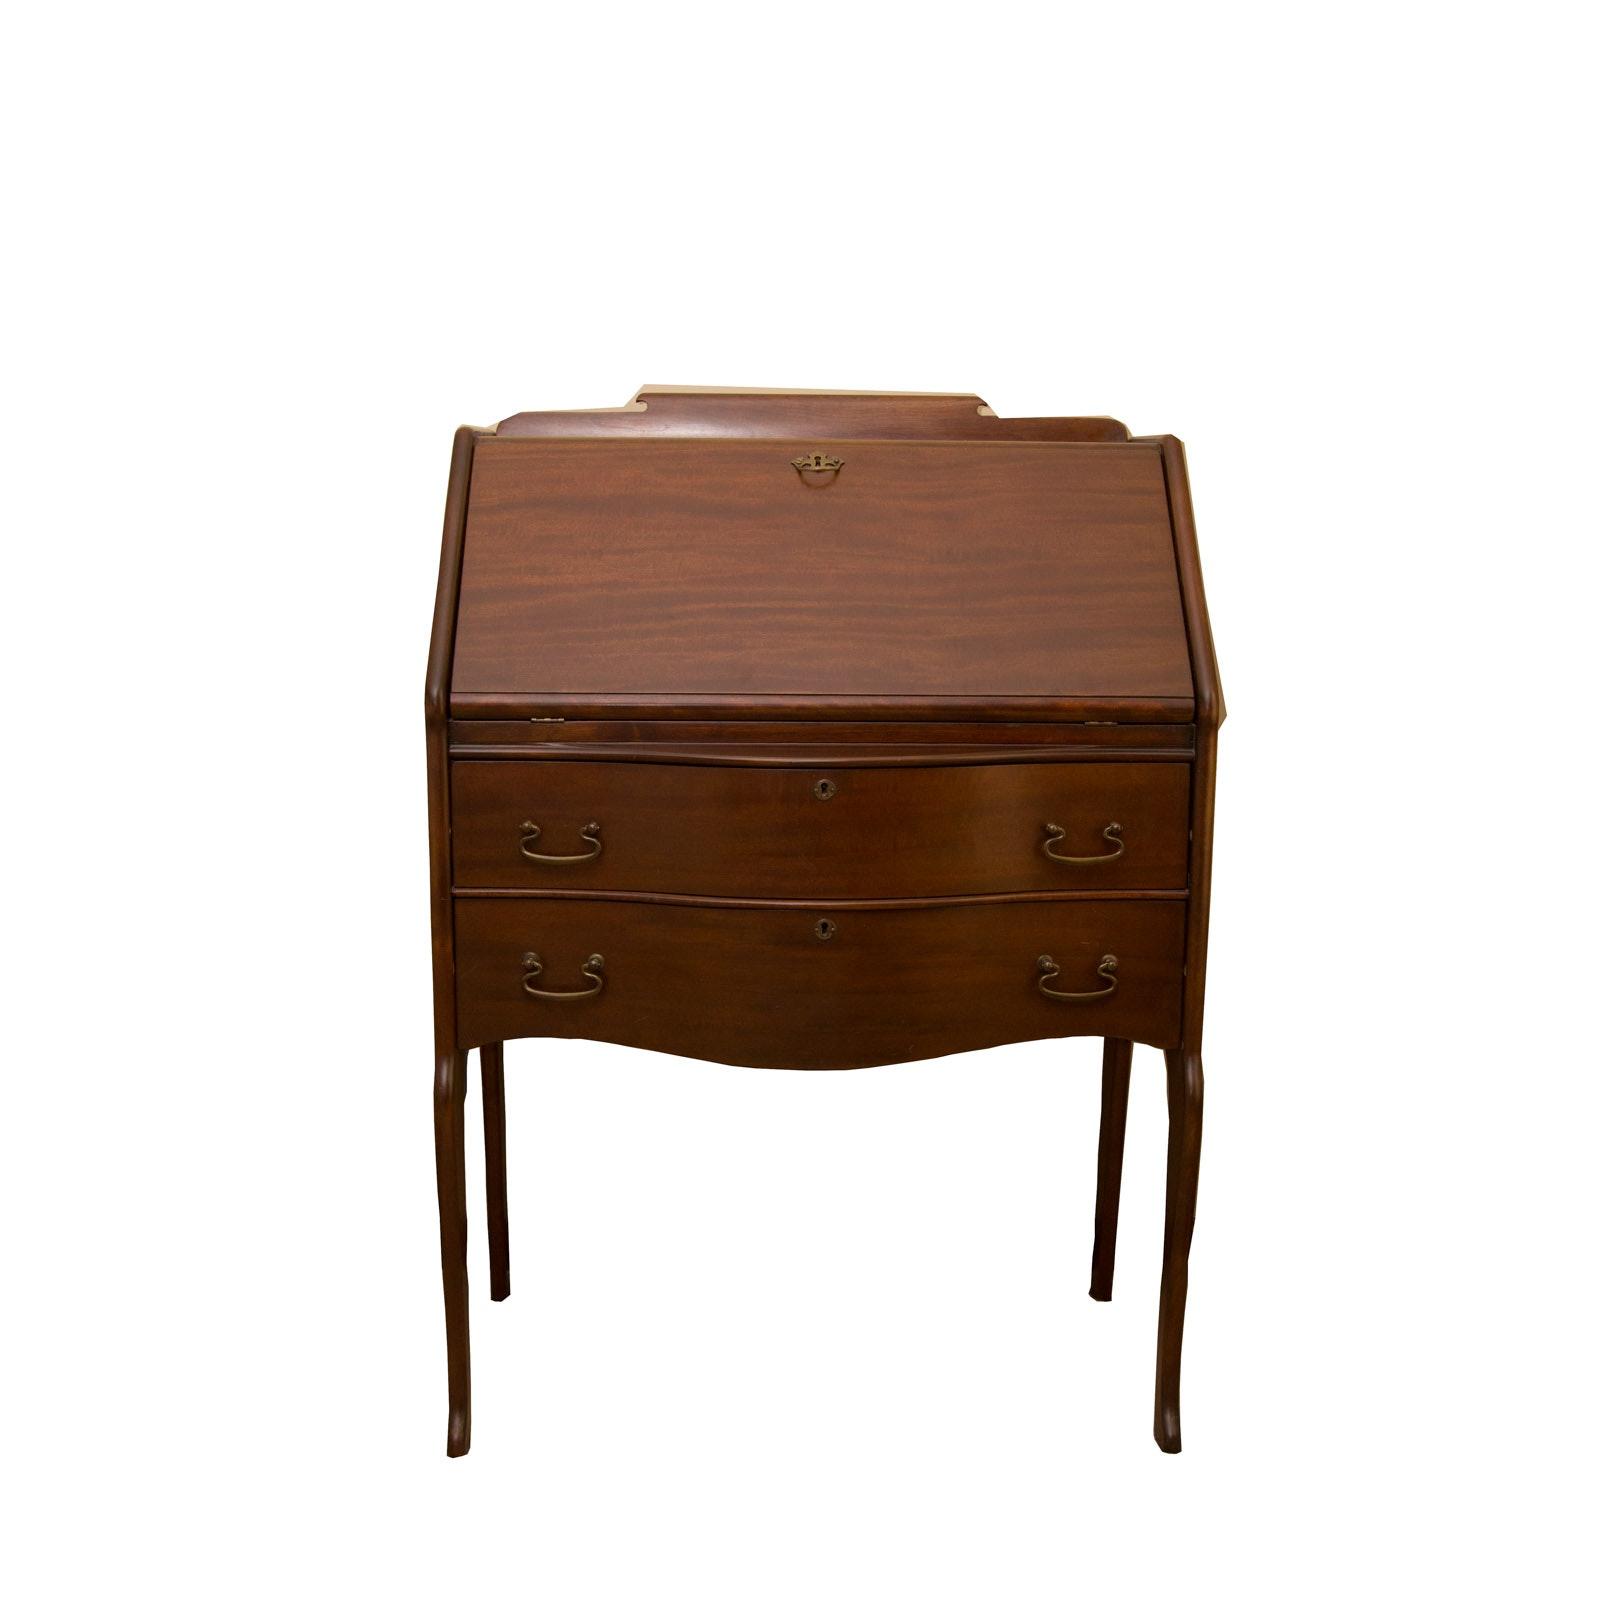 Vintage Wooden Secretary